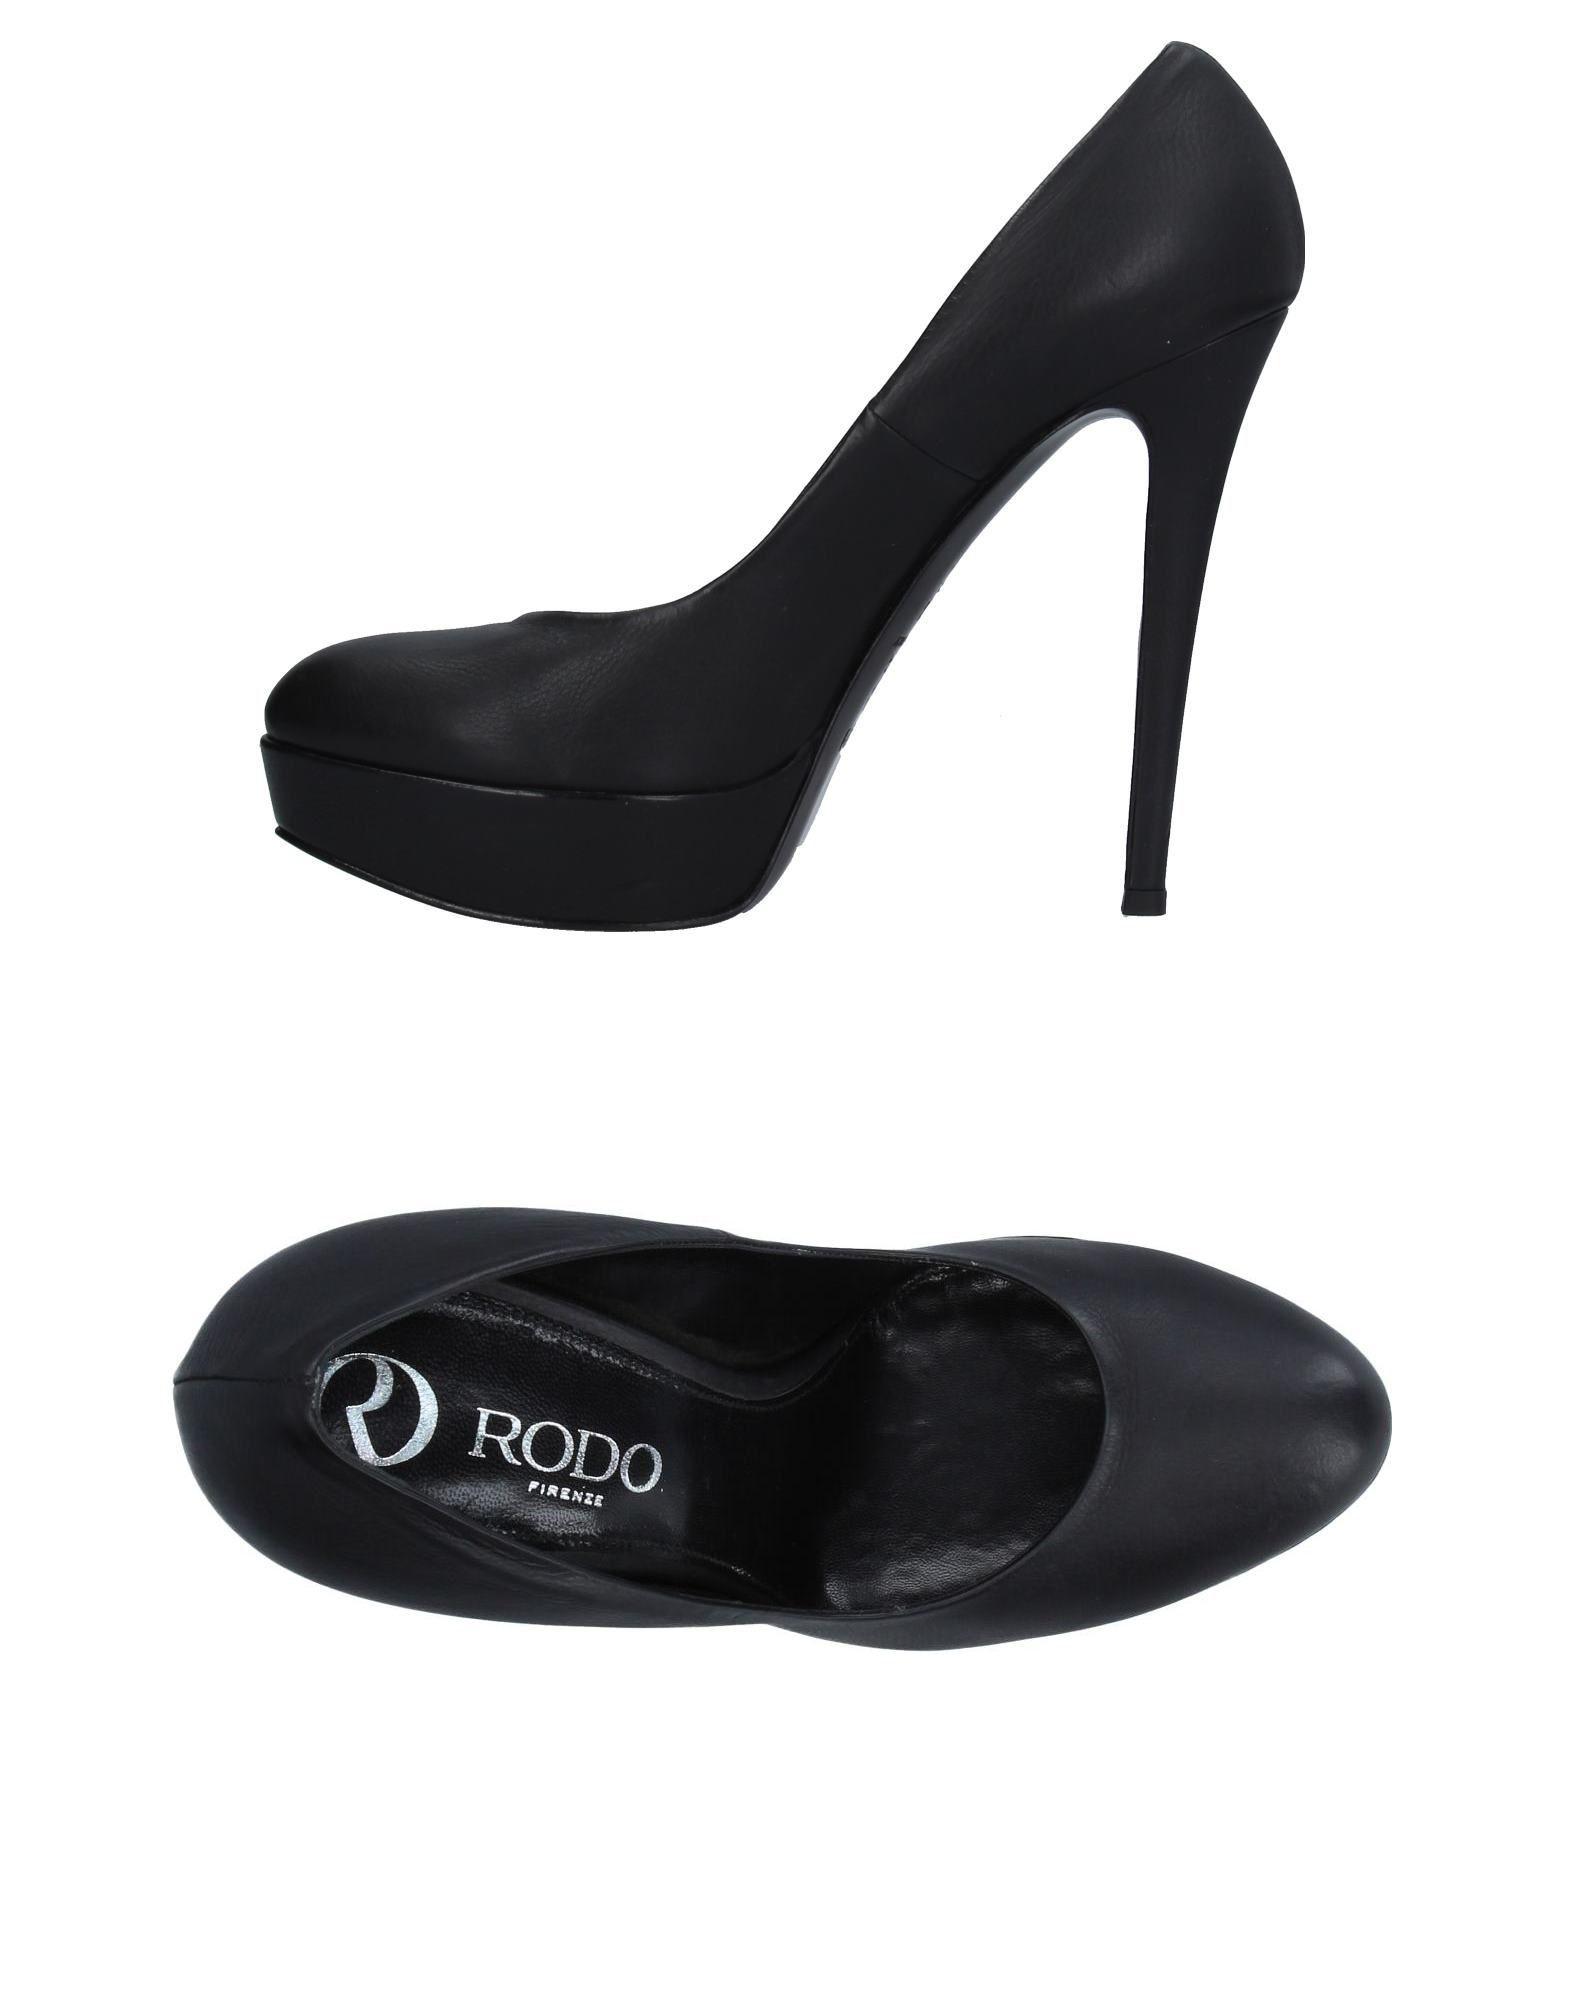 Rodo Pumps Damen  11254695MW Gute Qualität beliebte Schuhe